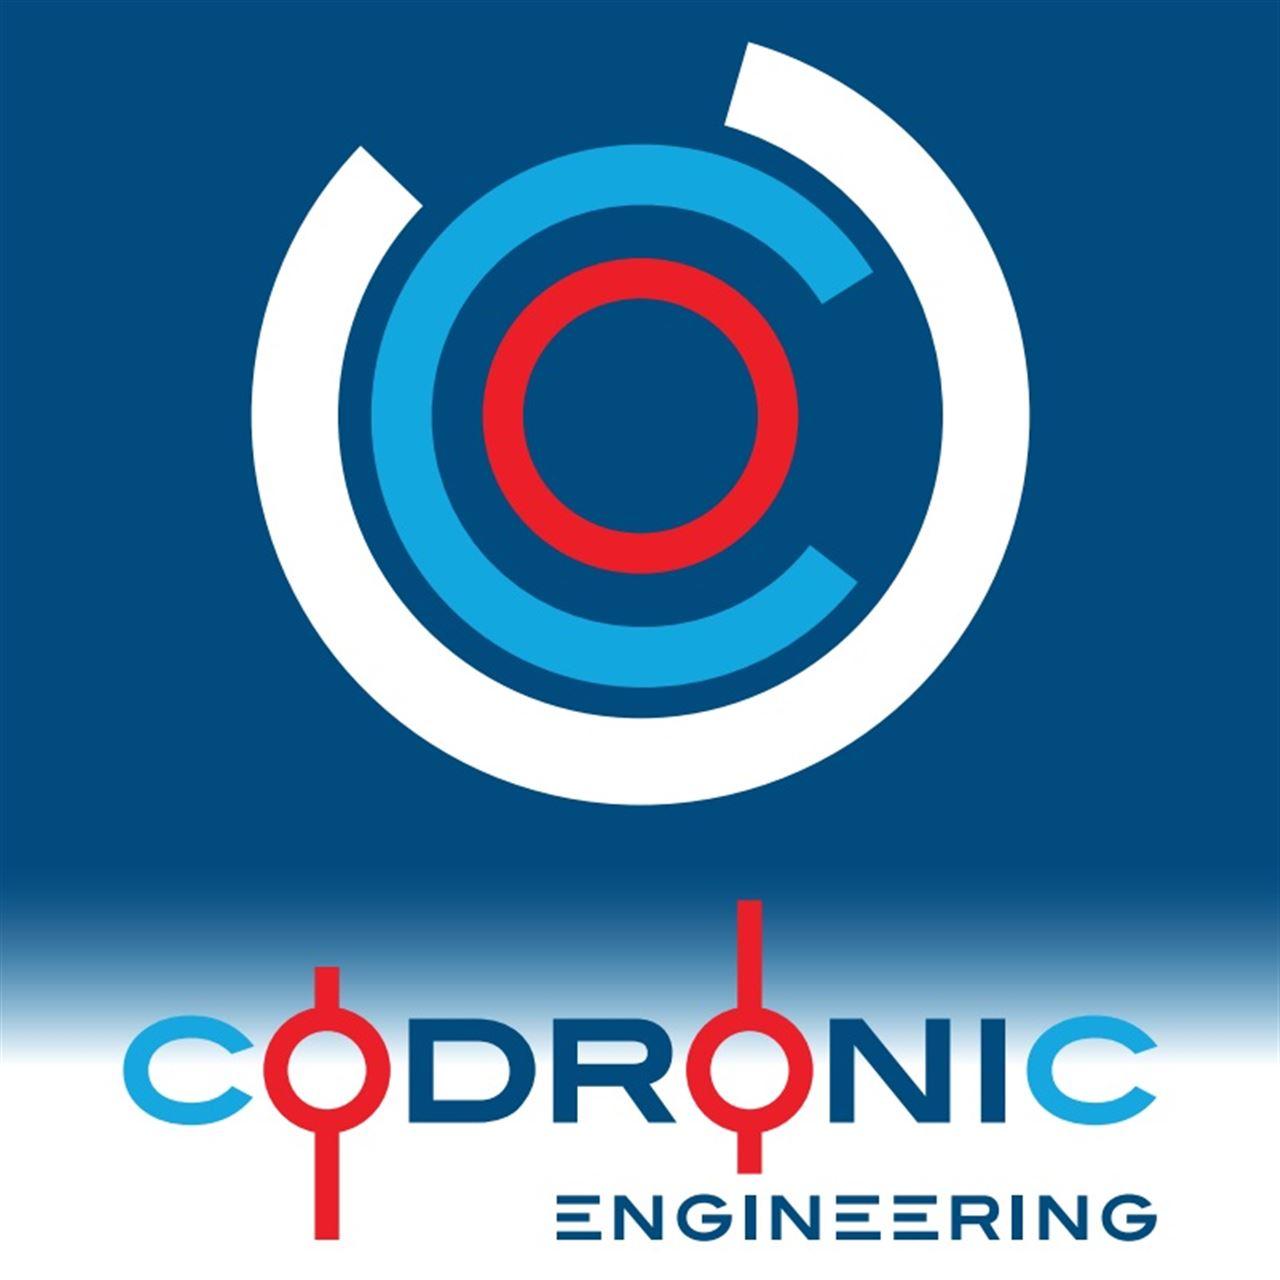 Codronic GmbH